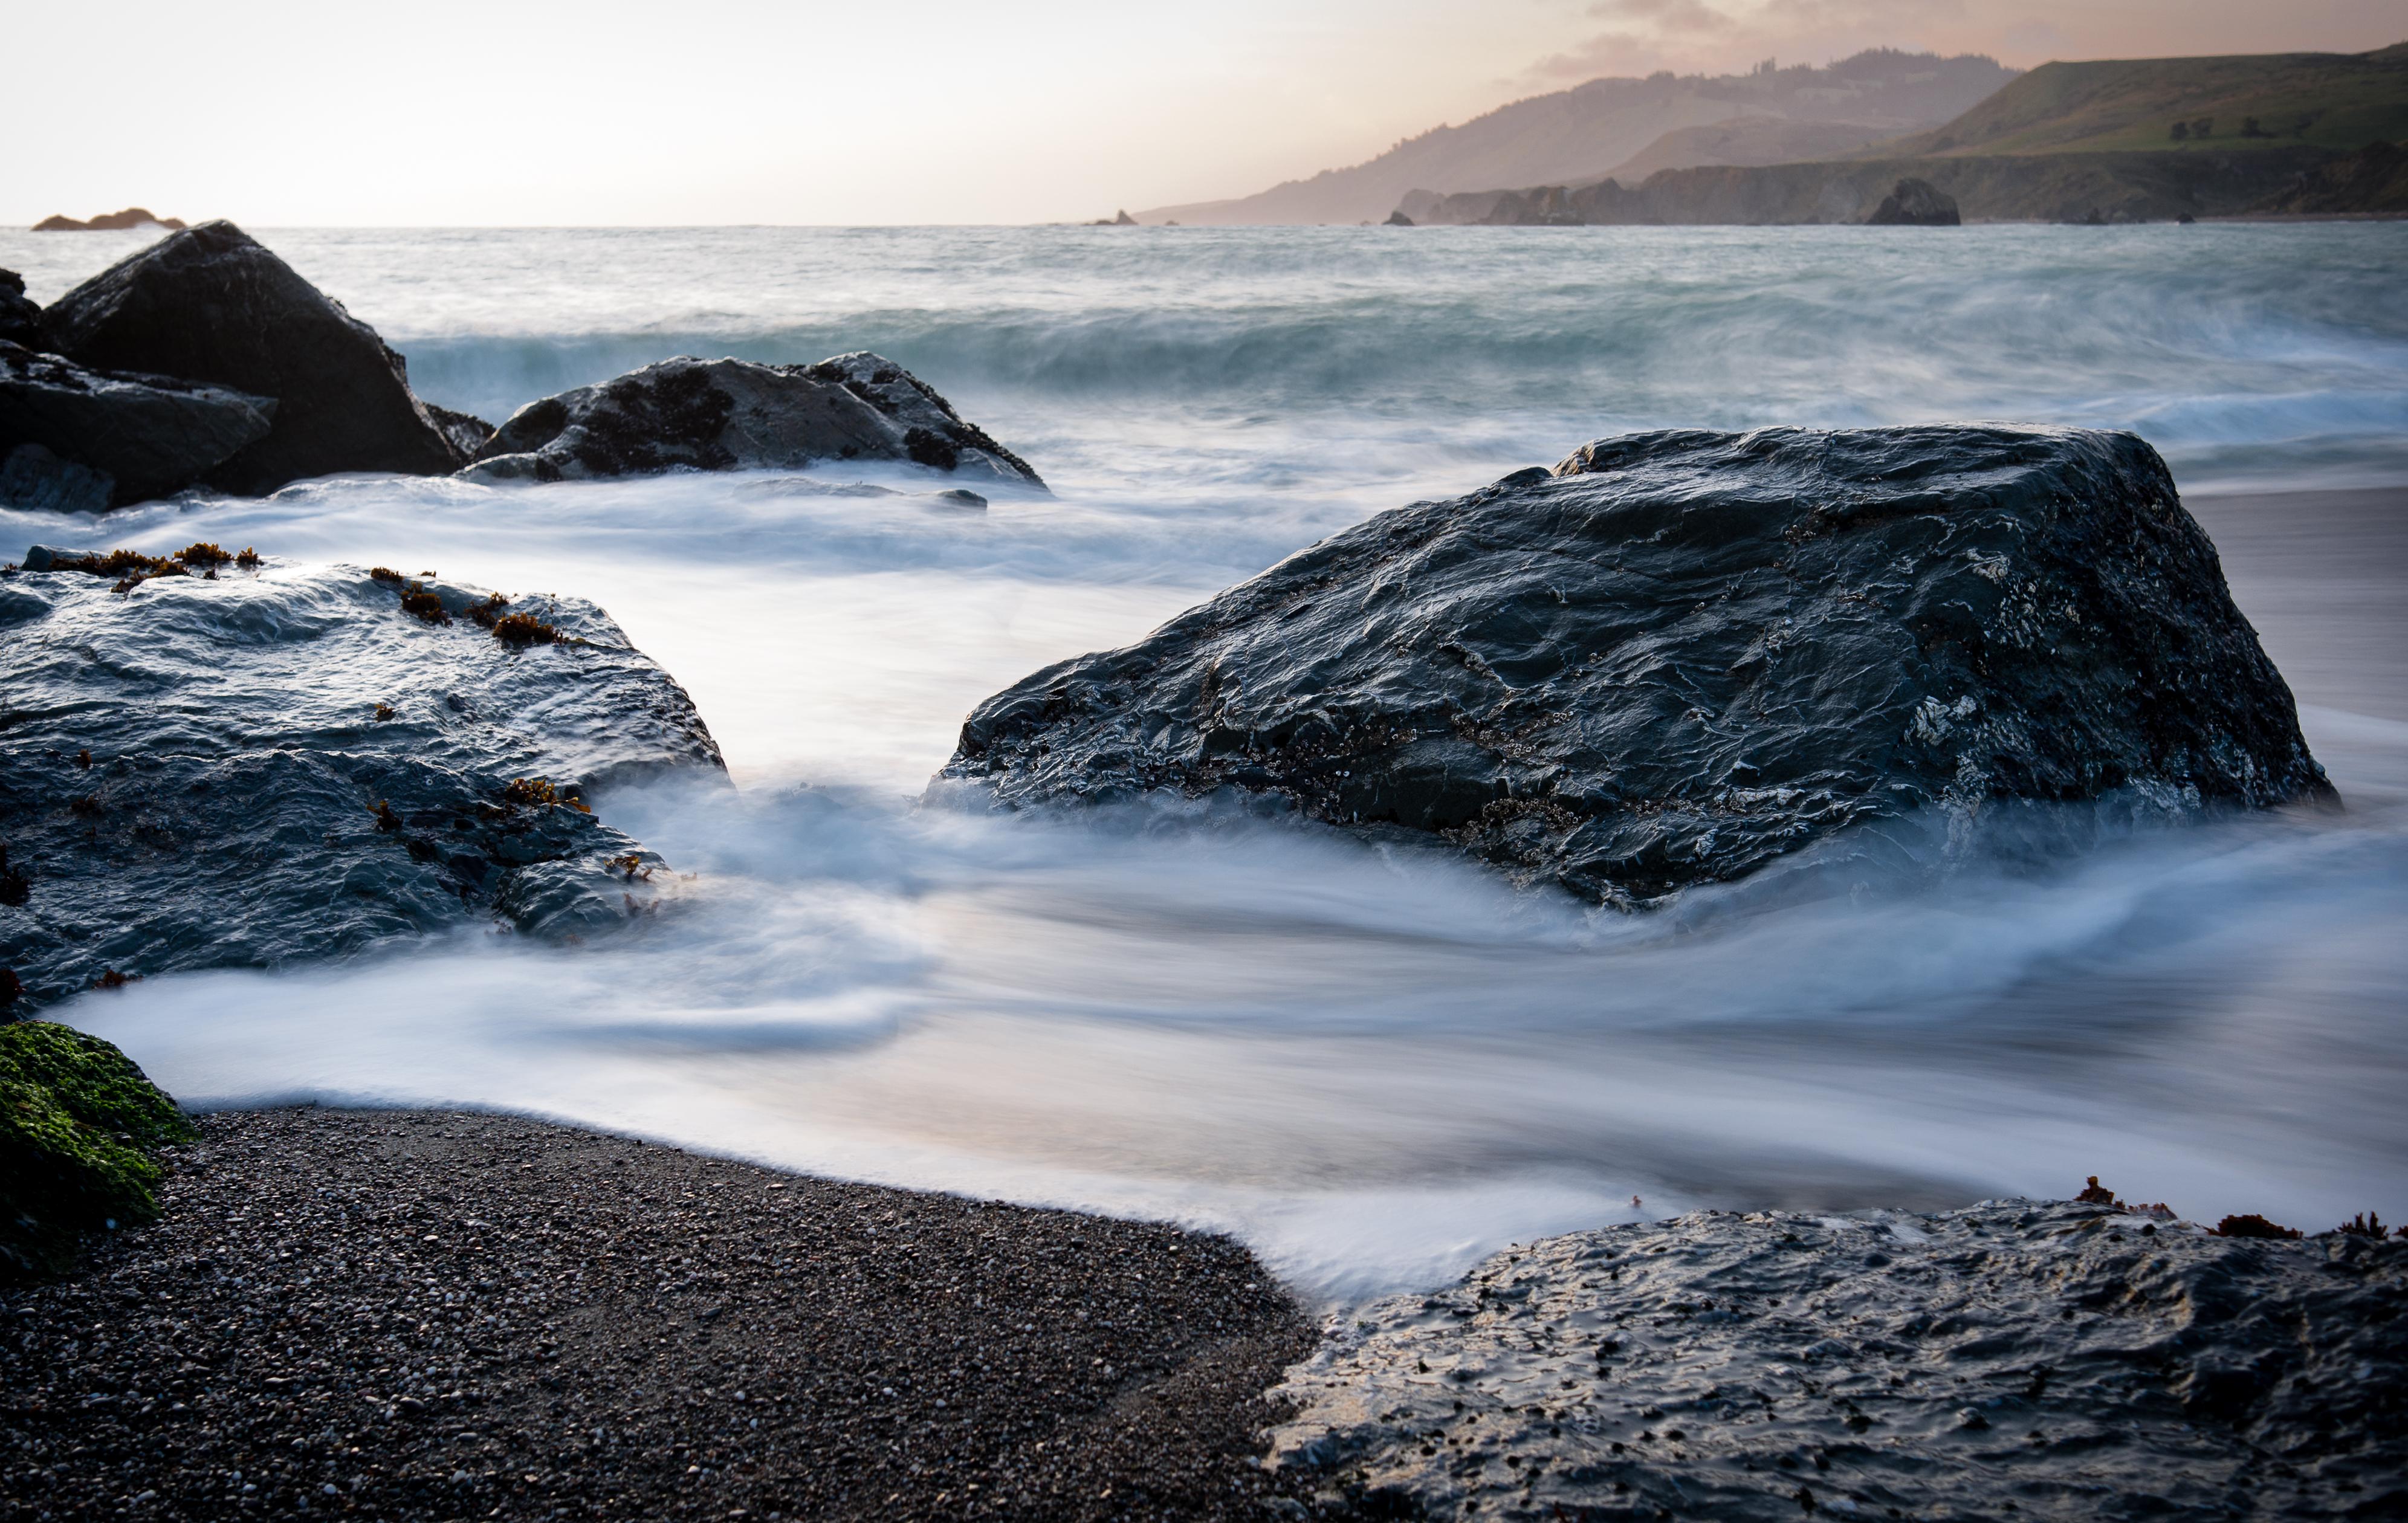 File:Rocks and surf on Goat Rock Beach.jpg - Wikimedia Commons